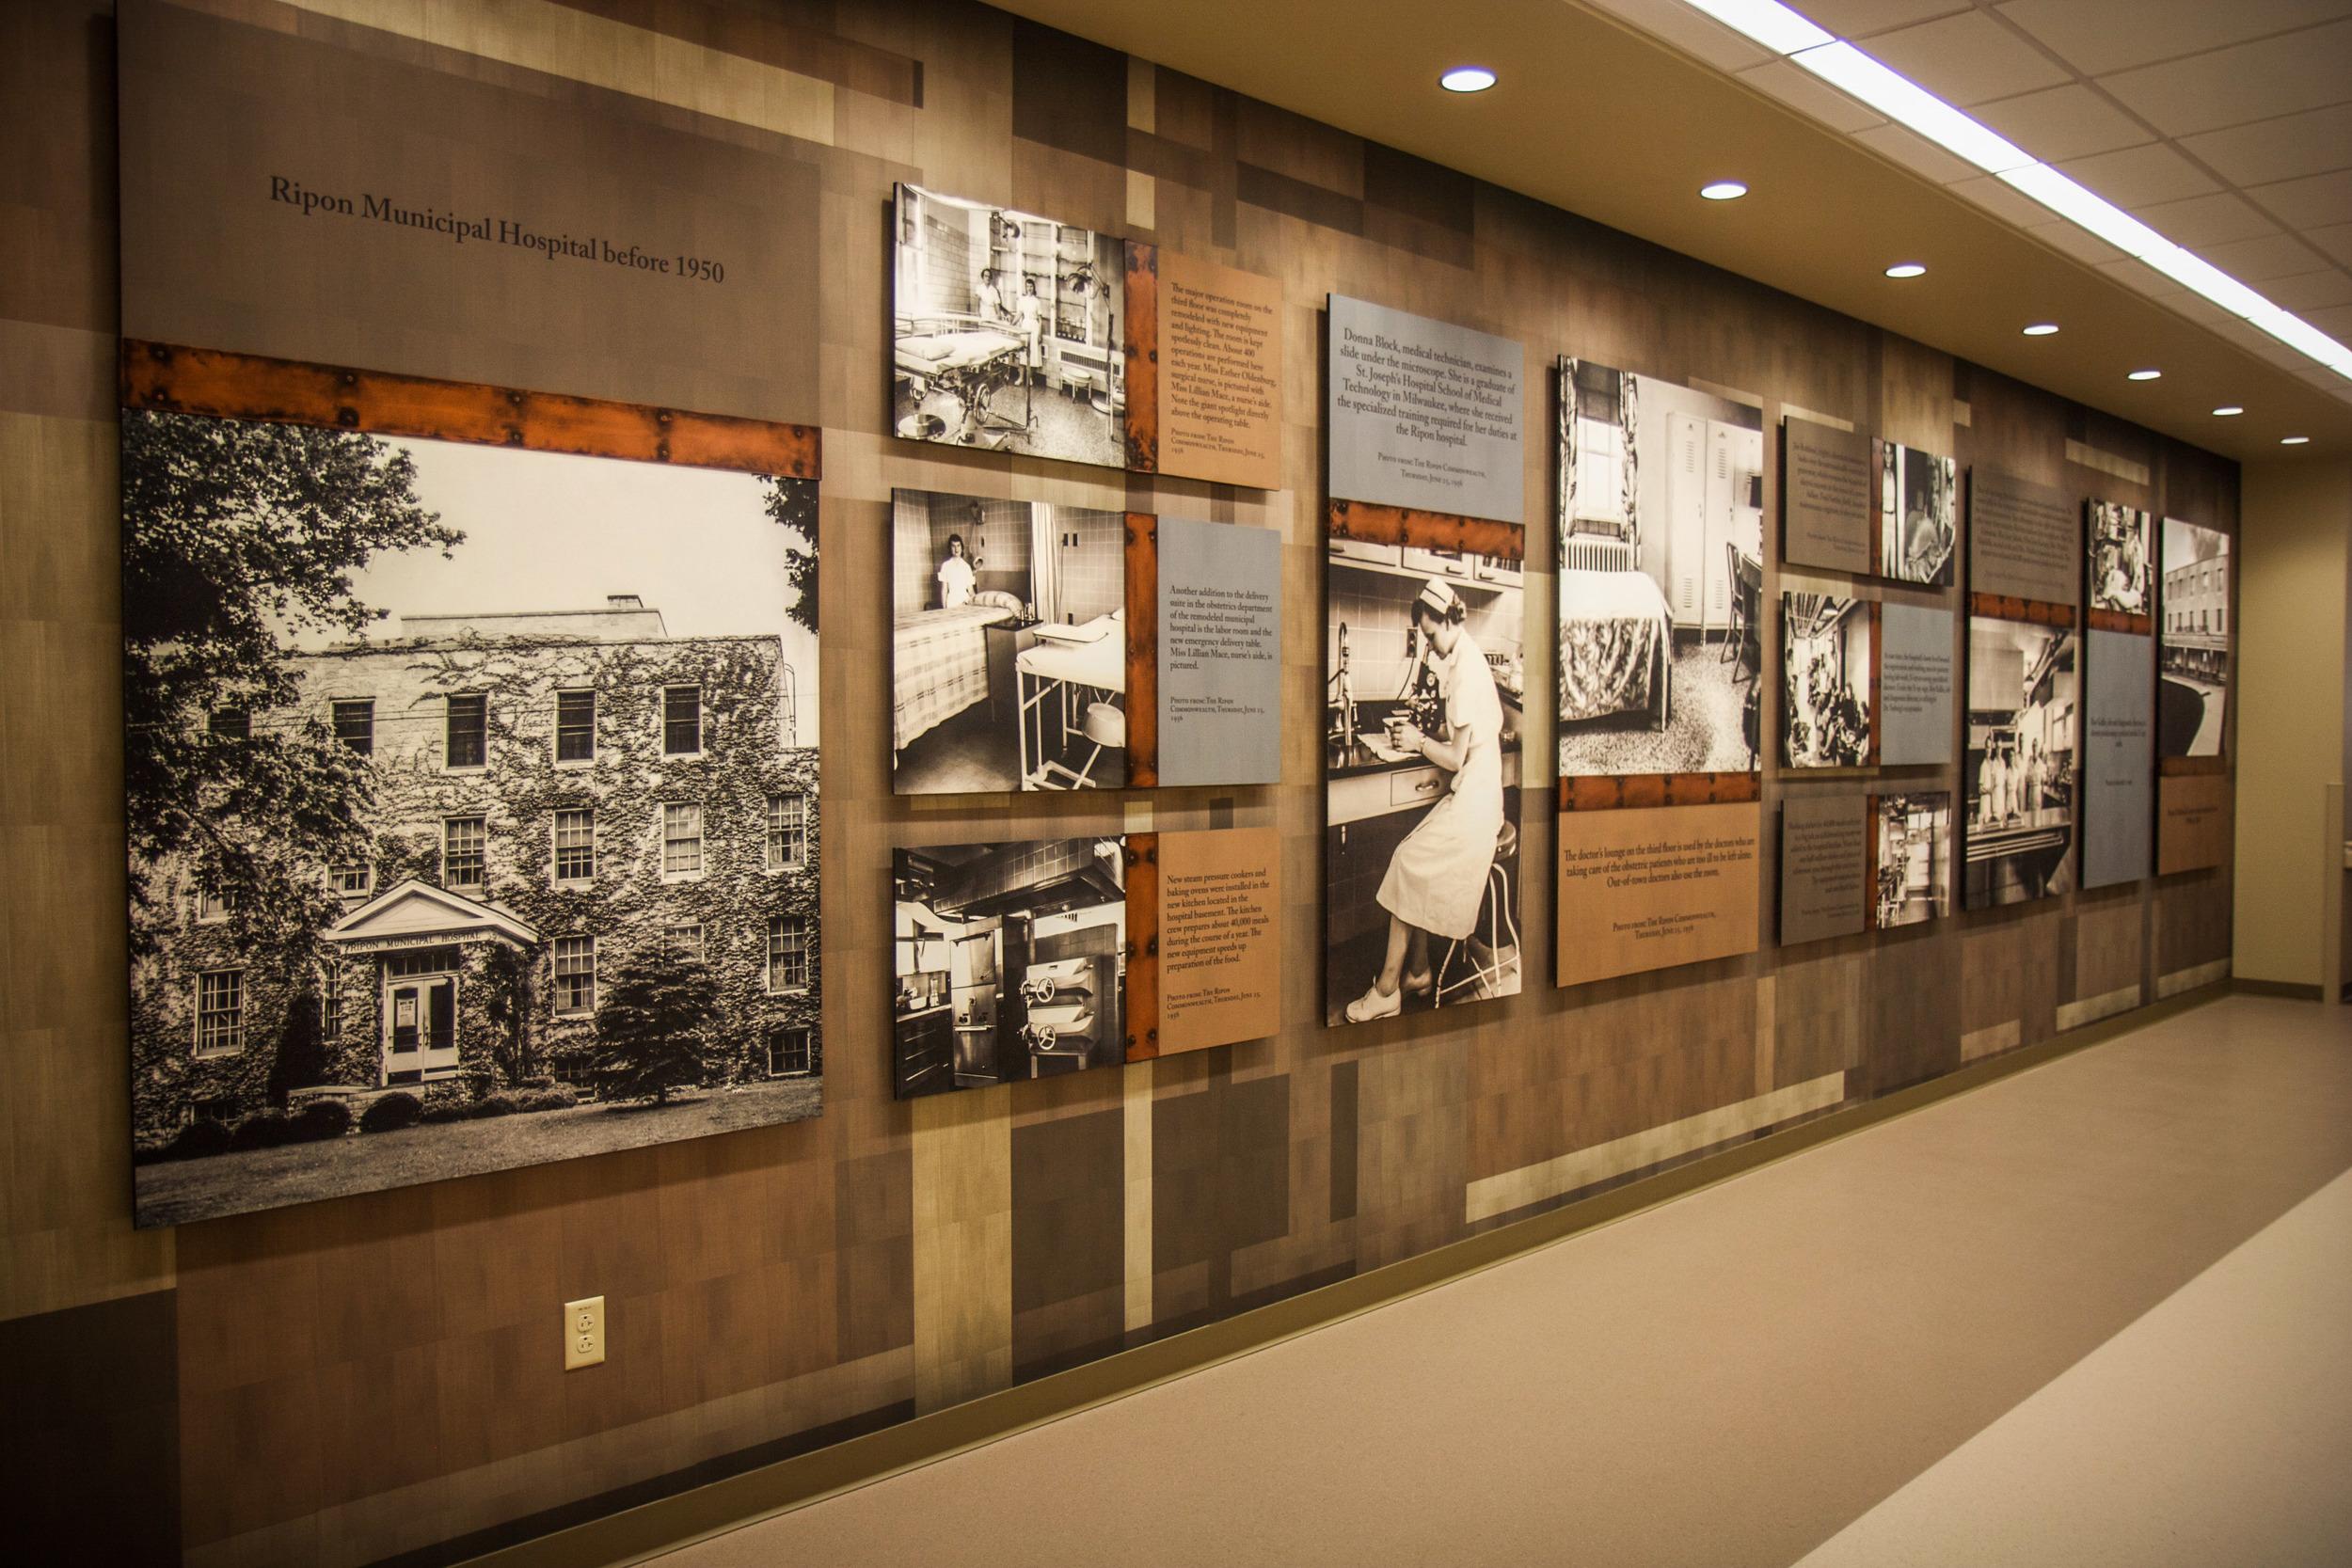 Ripon Medical Center